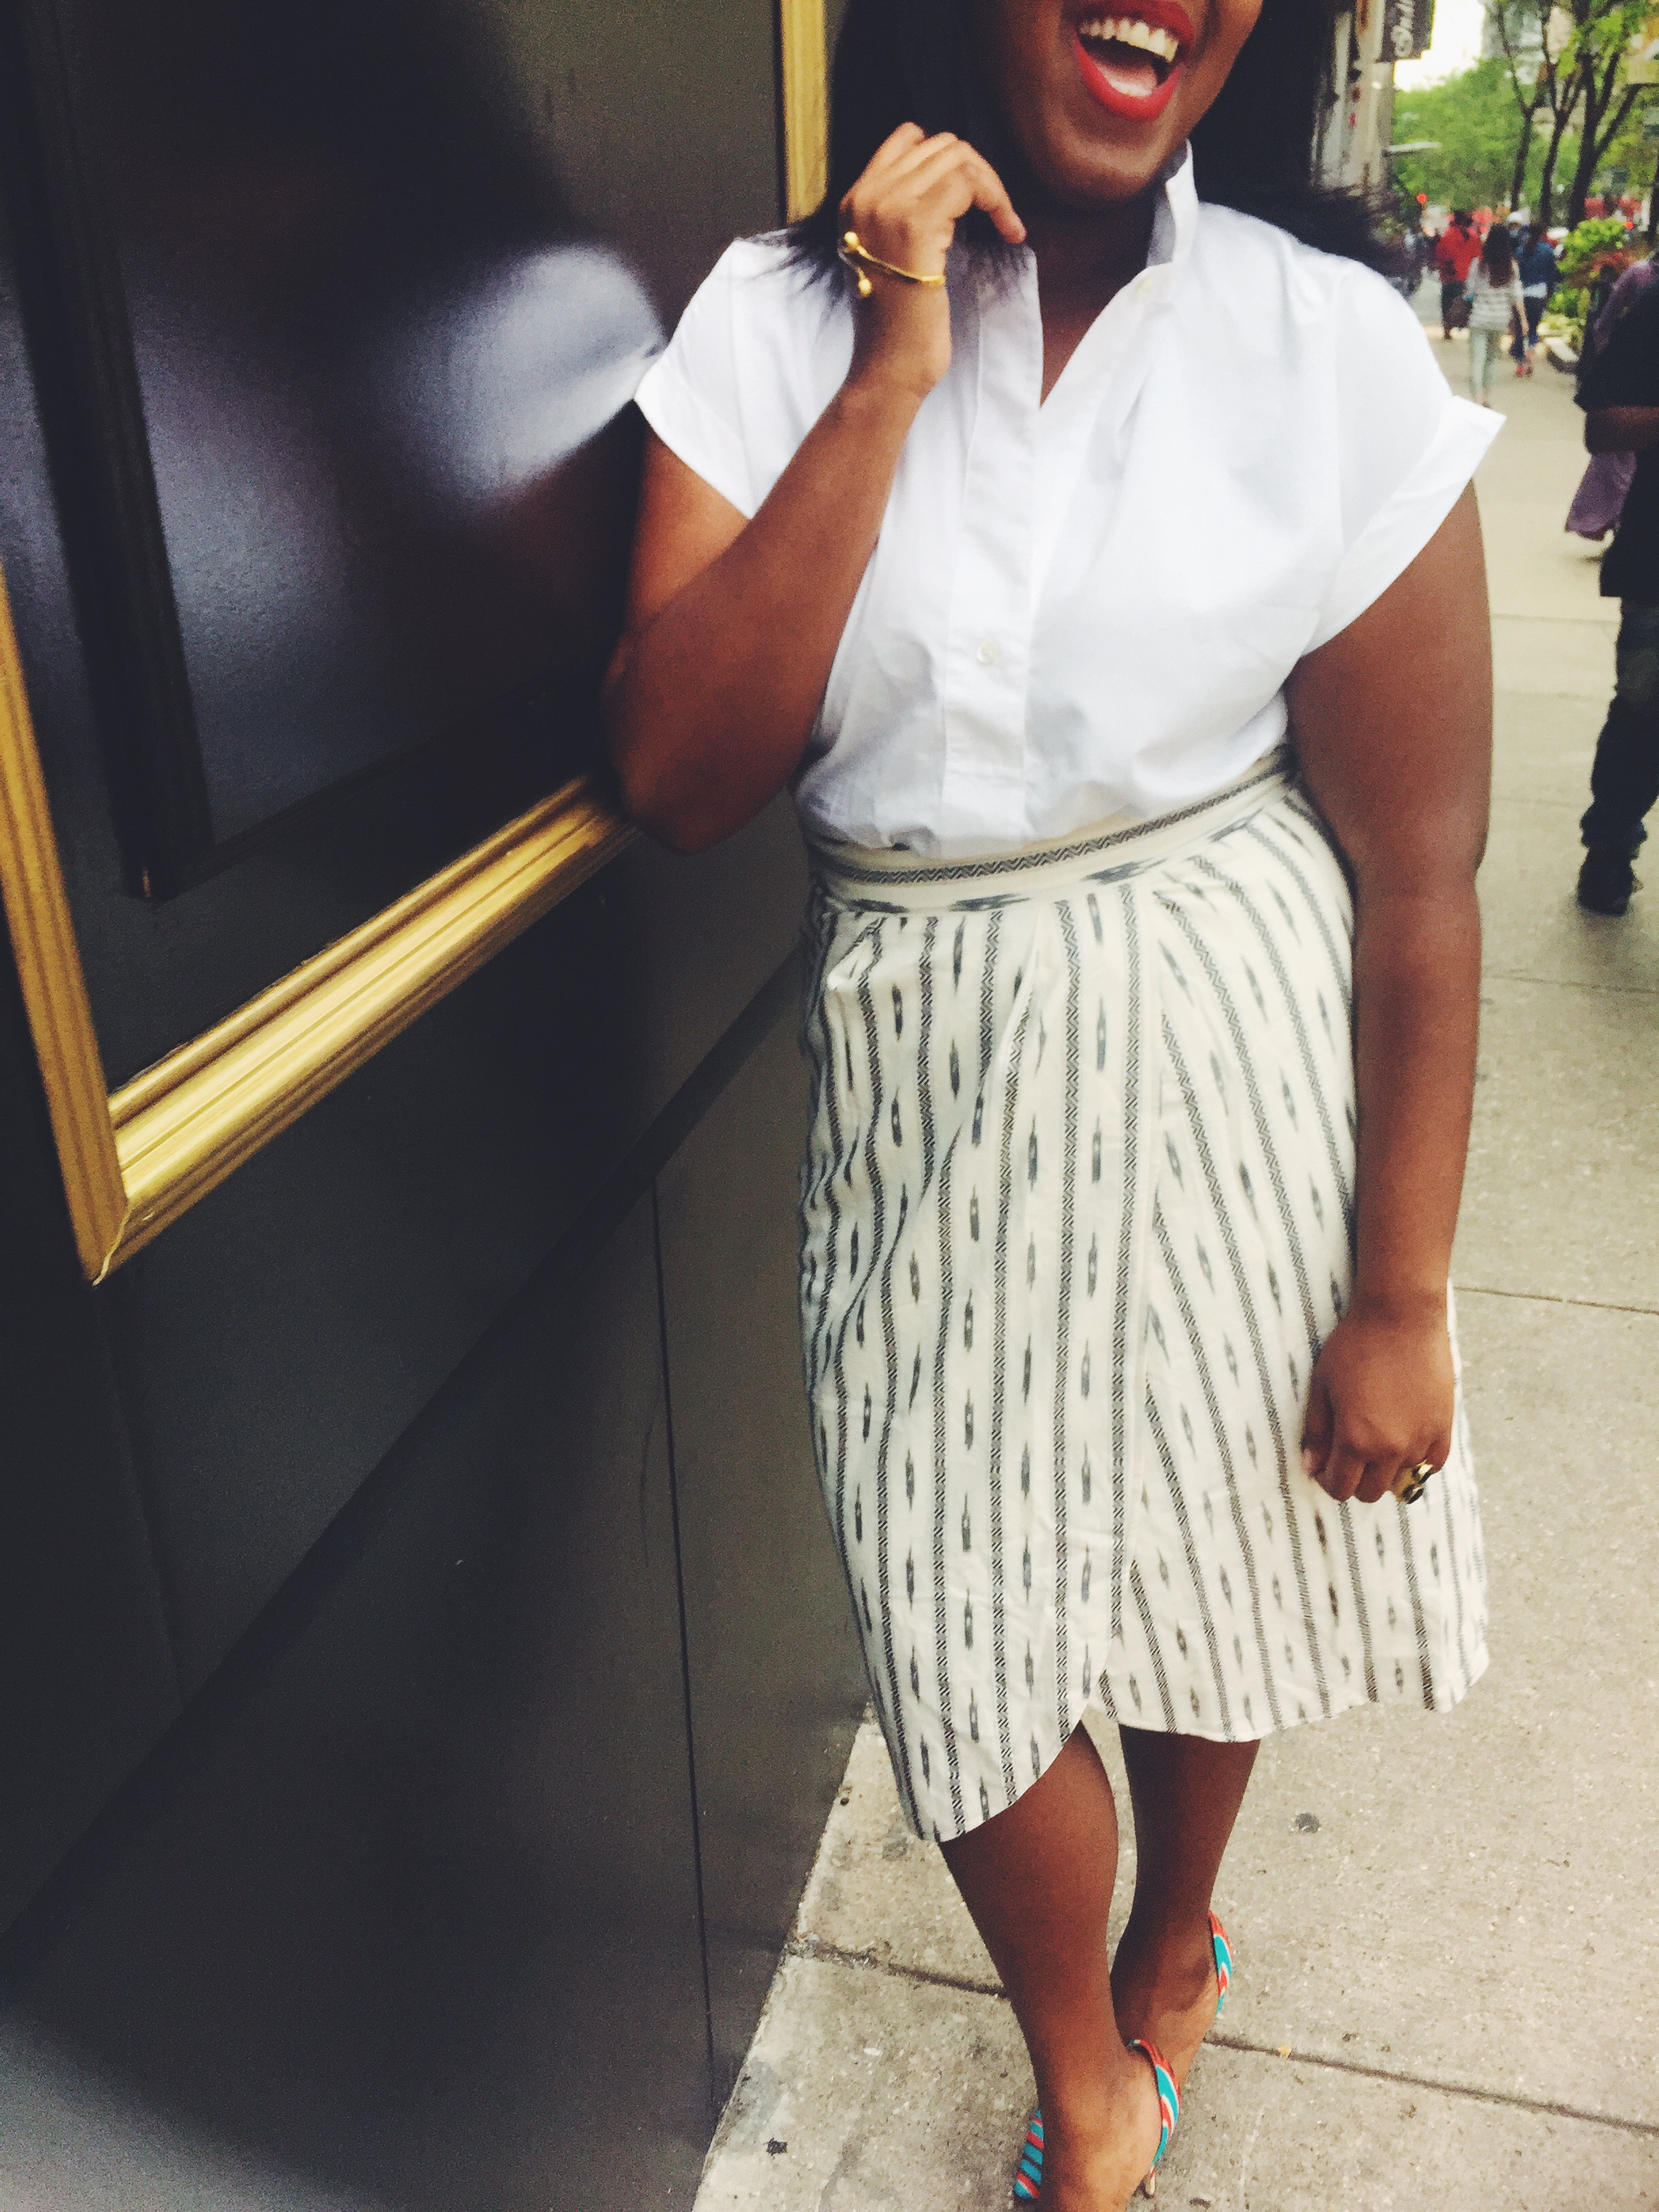 Jcrew Faux-wrap skirt in ivory ikat Elsie fabric d'orsay pumps Jcrew short sleeve popover shirt that hayet rida 1 .jpeg